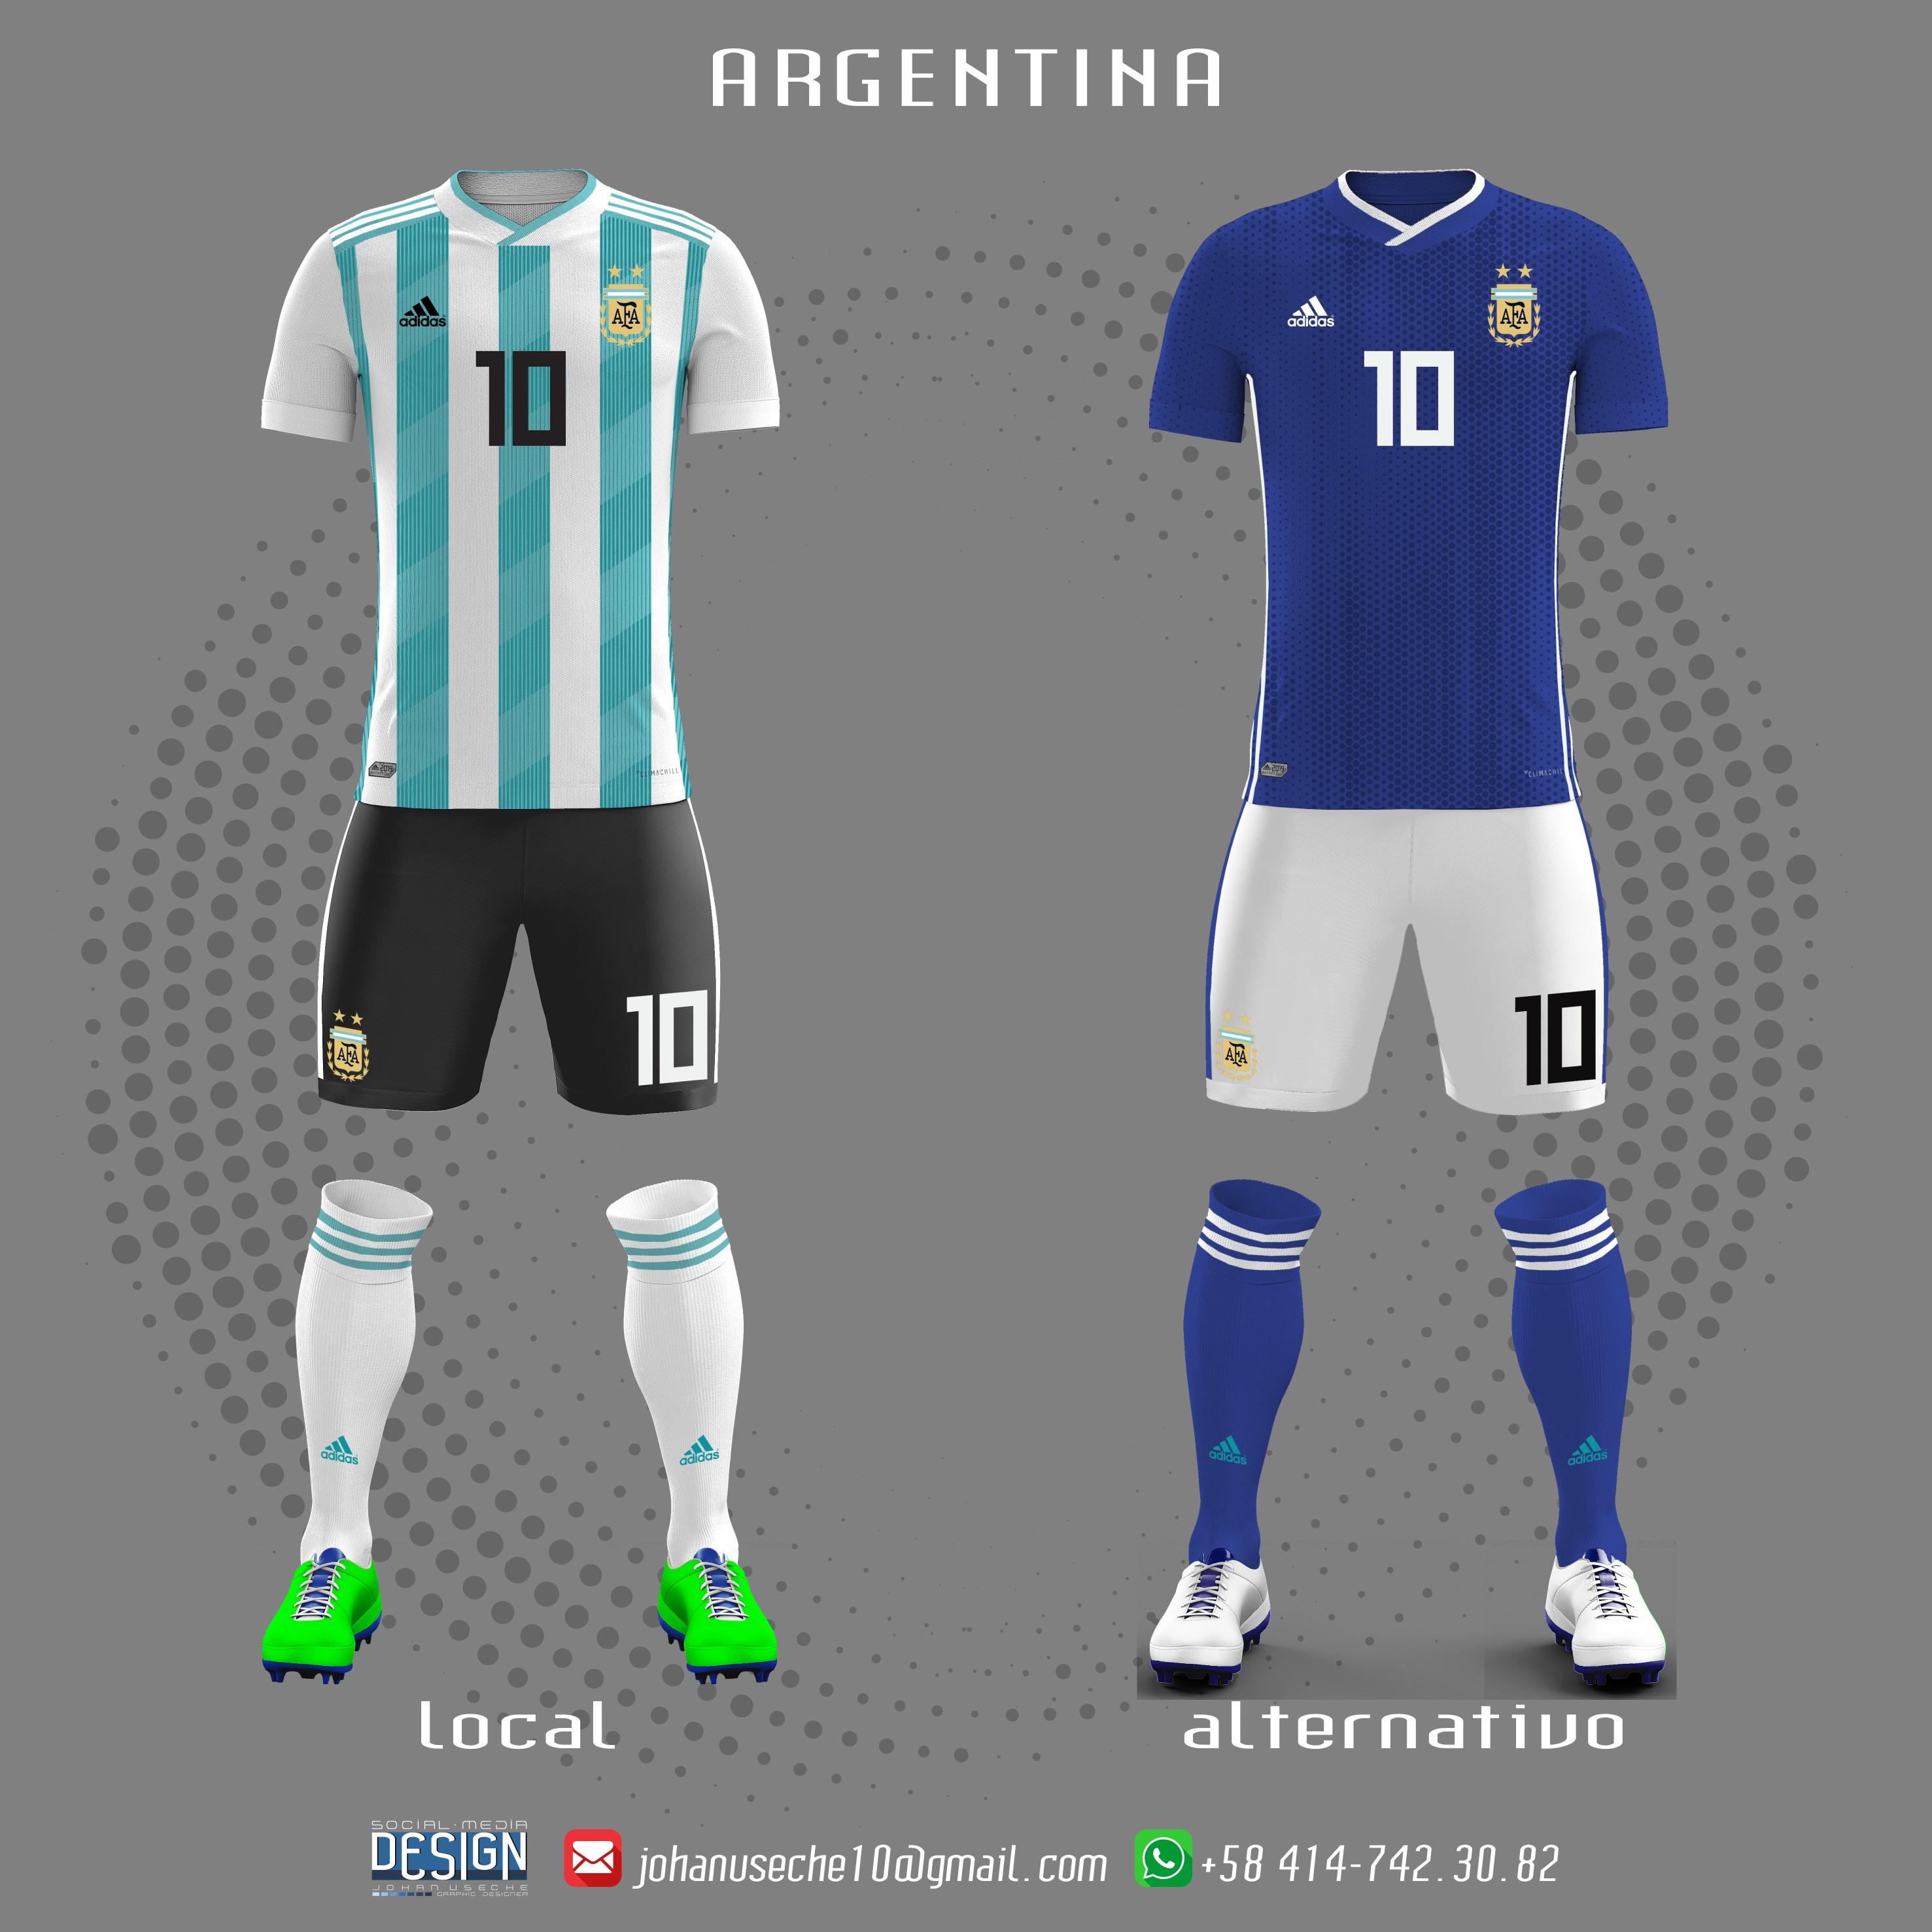 kit Argentina copa américa 2019 no oficial